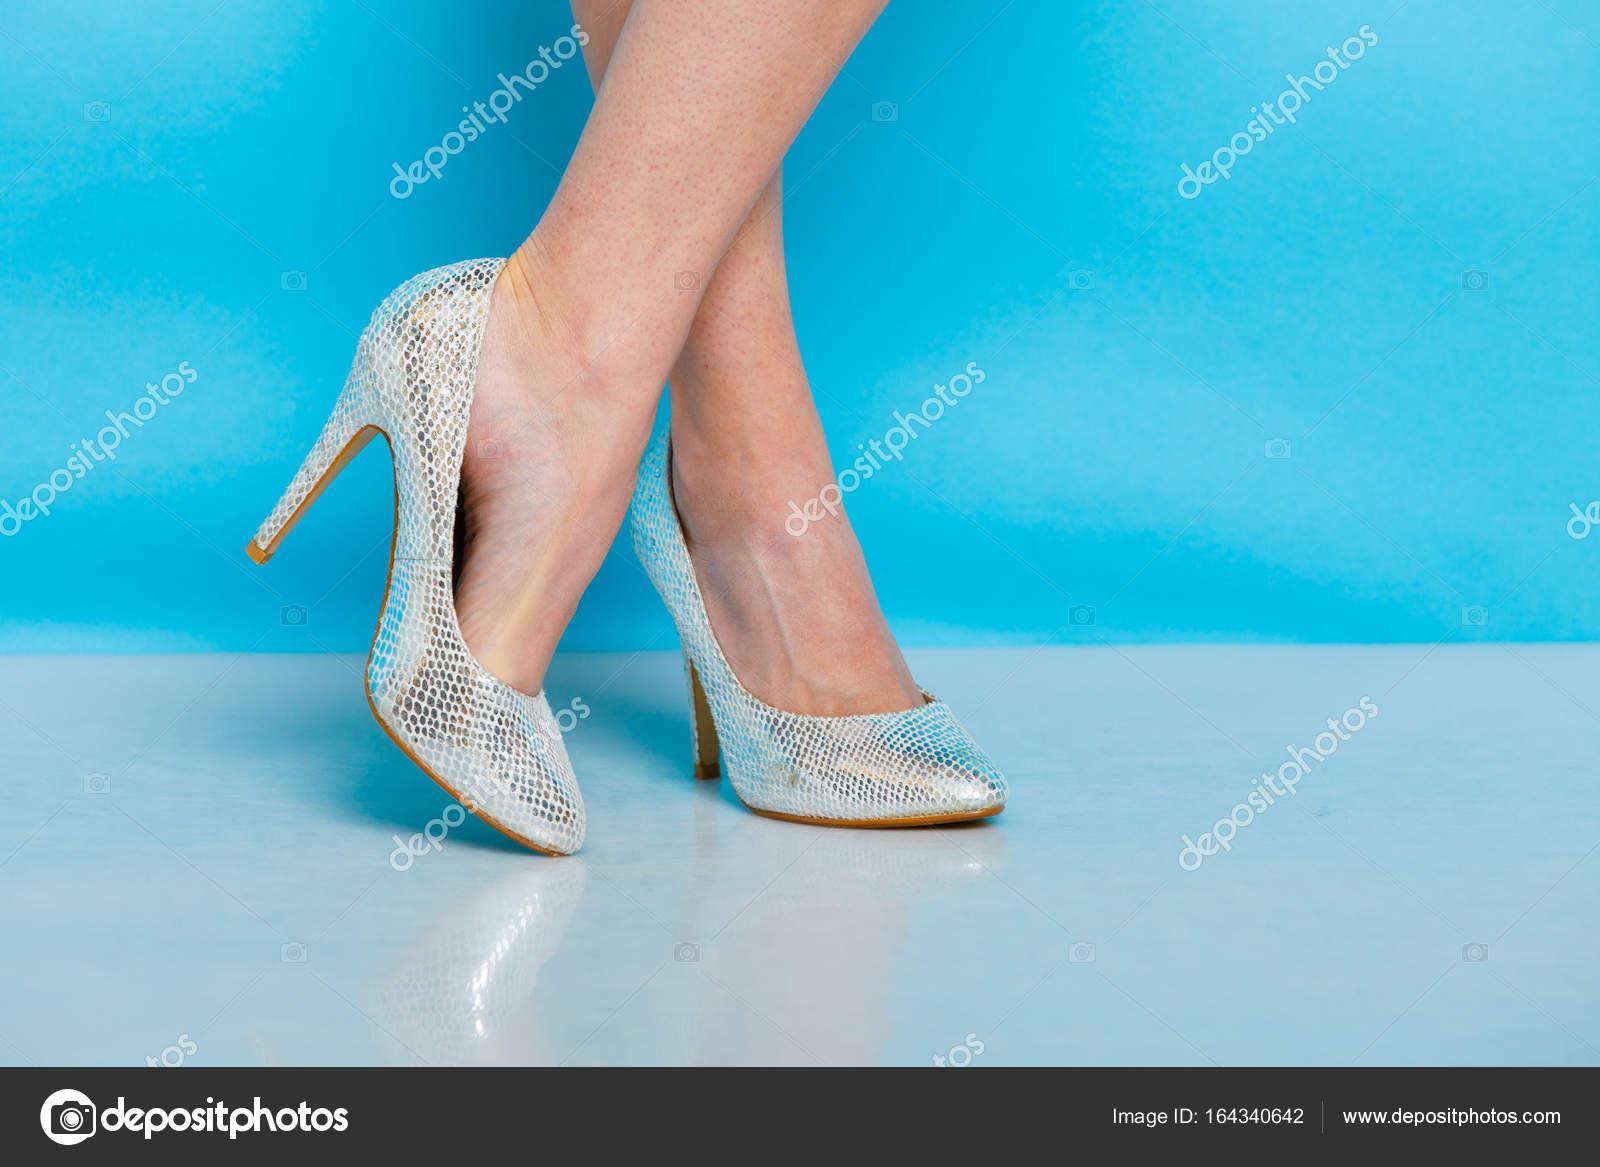 7ad9b42c501 Γυναικεία Μόδα. Ασημένια ψηλά τακούνια εμβολιάζεται μοντέρνα παπούτσια στα  πόδια. Studio πυροβόλησε εναντίον μπλε — Εικόνα από ...